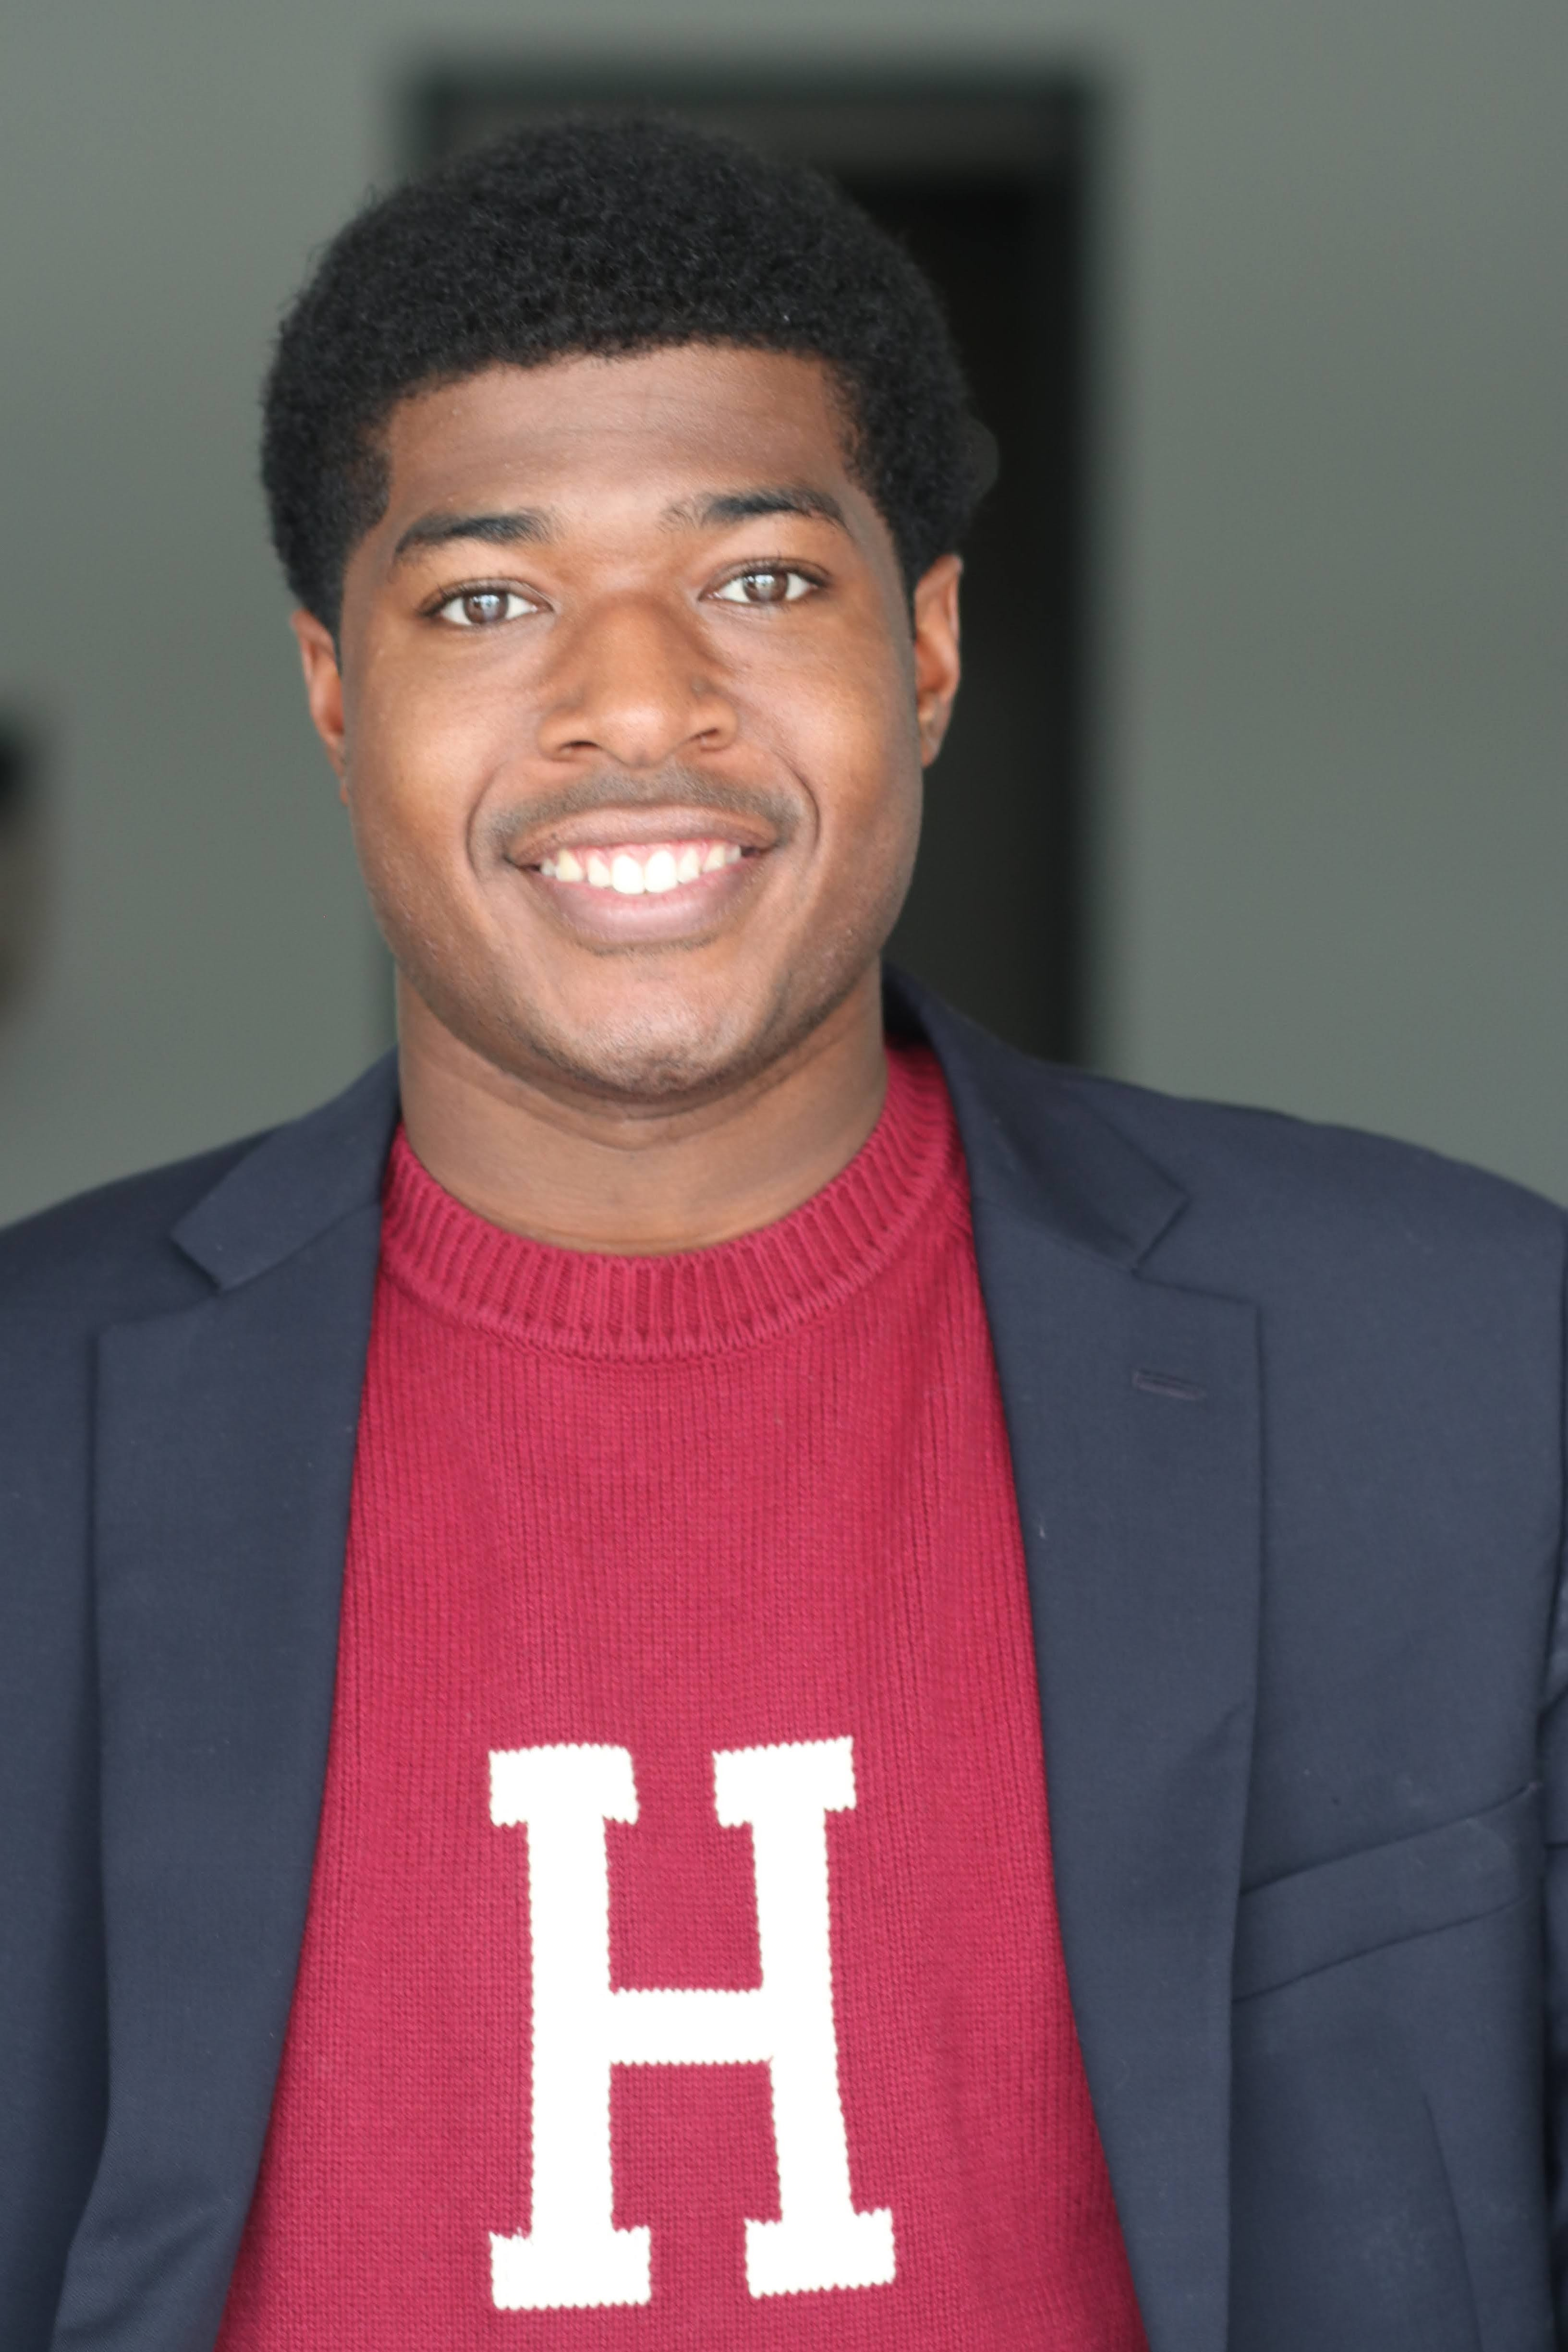 Meet Noah Harris, the first Black man Harvard s student body elected as council president